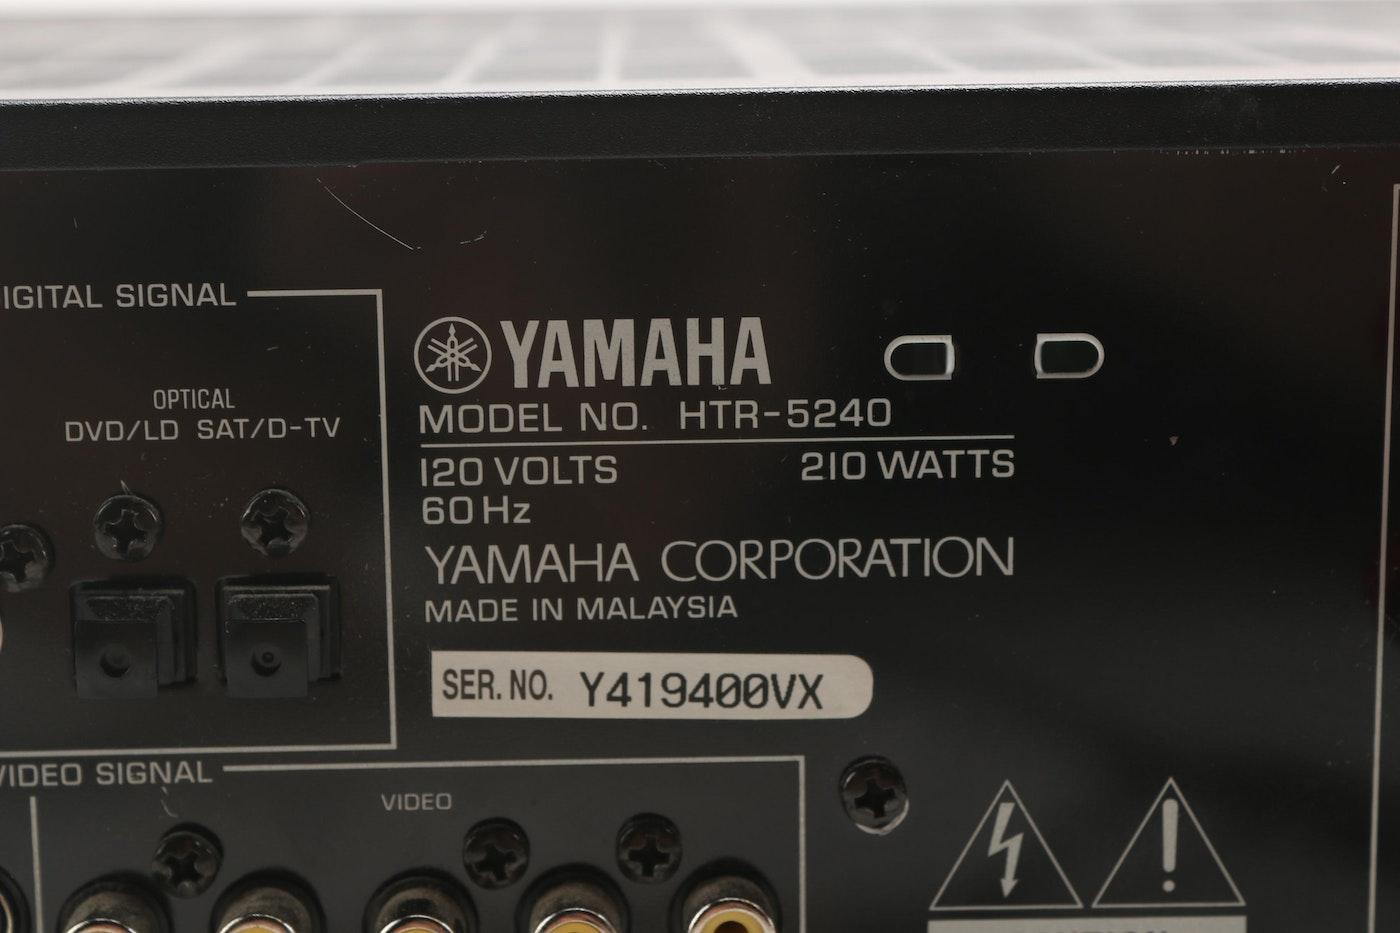 Yamaha AV Receiver And Speakers